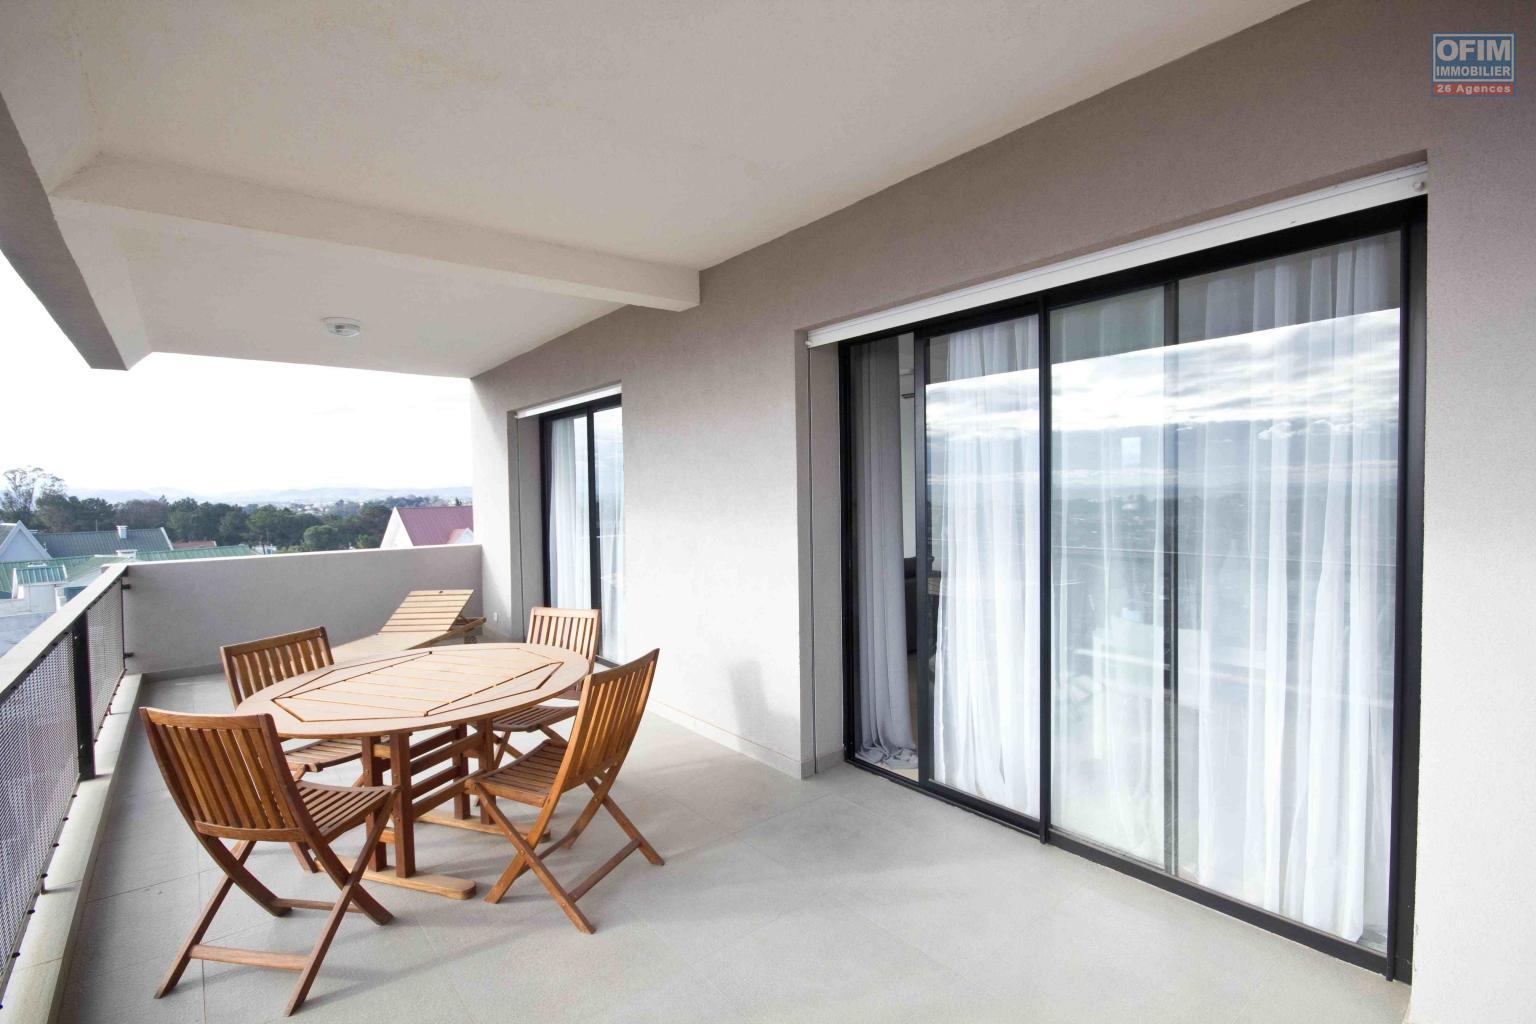 Vente appartement antananarivo tananarive a vendre for Vente de appartement